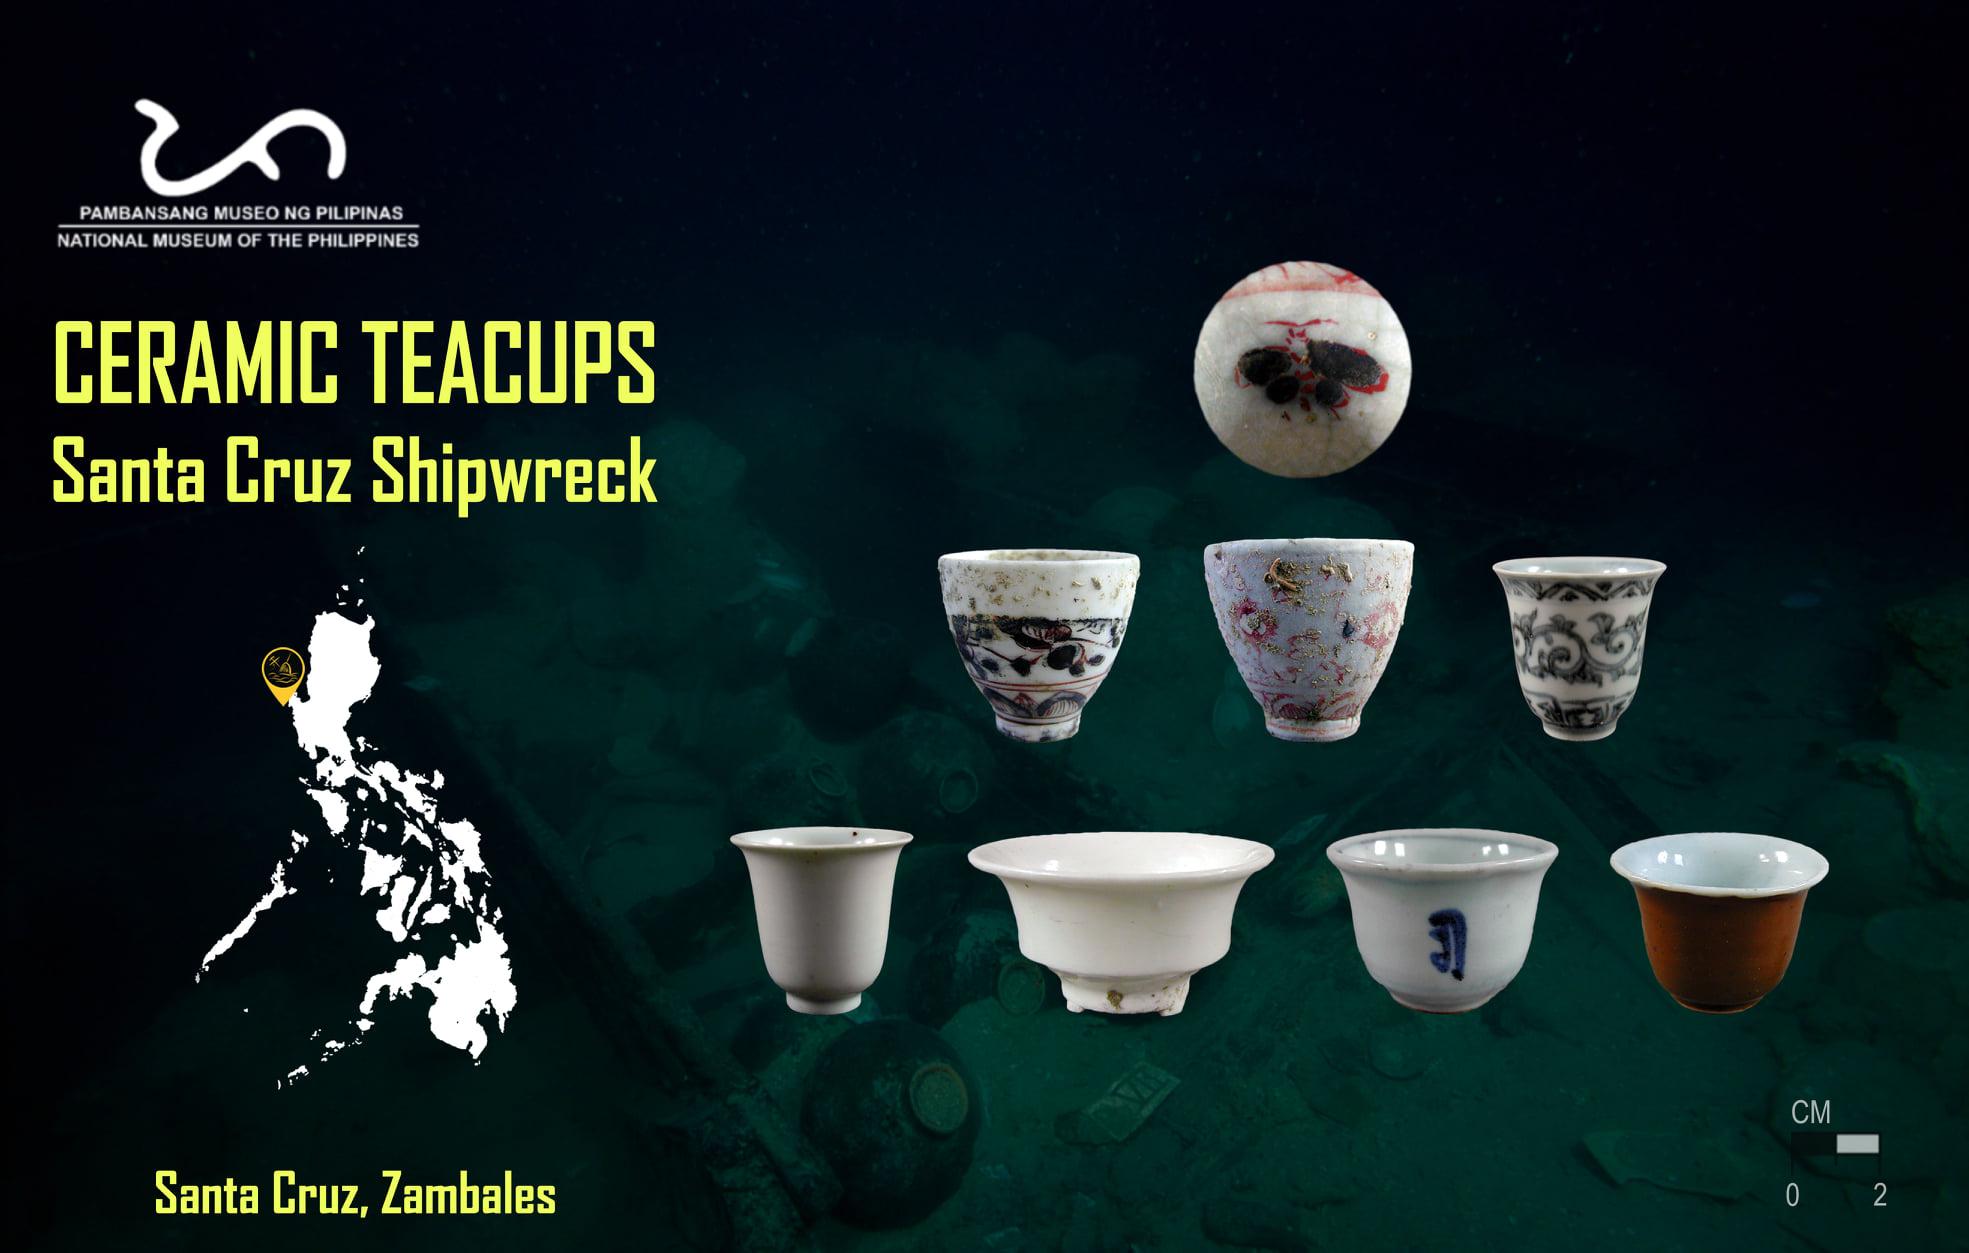 Chinese teacups of the Santa Cruz shipwreck